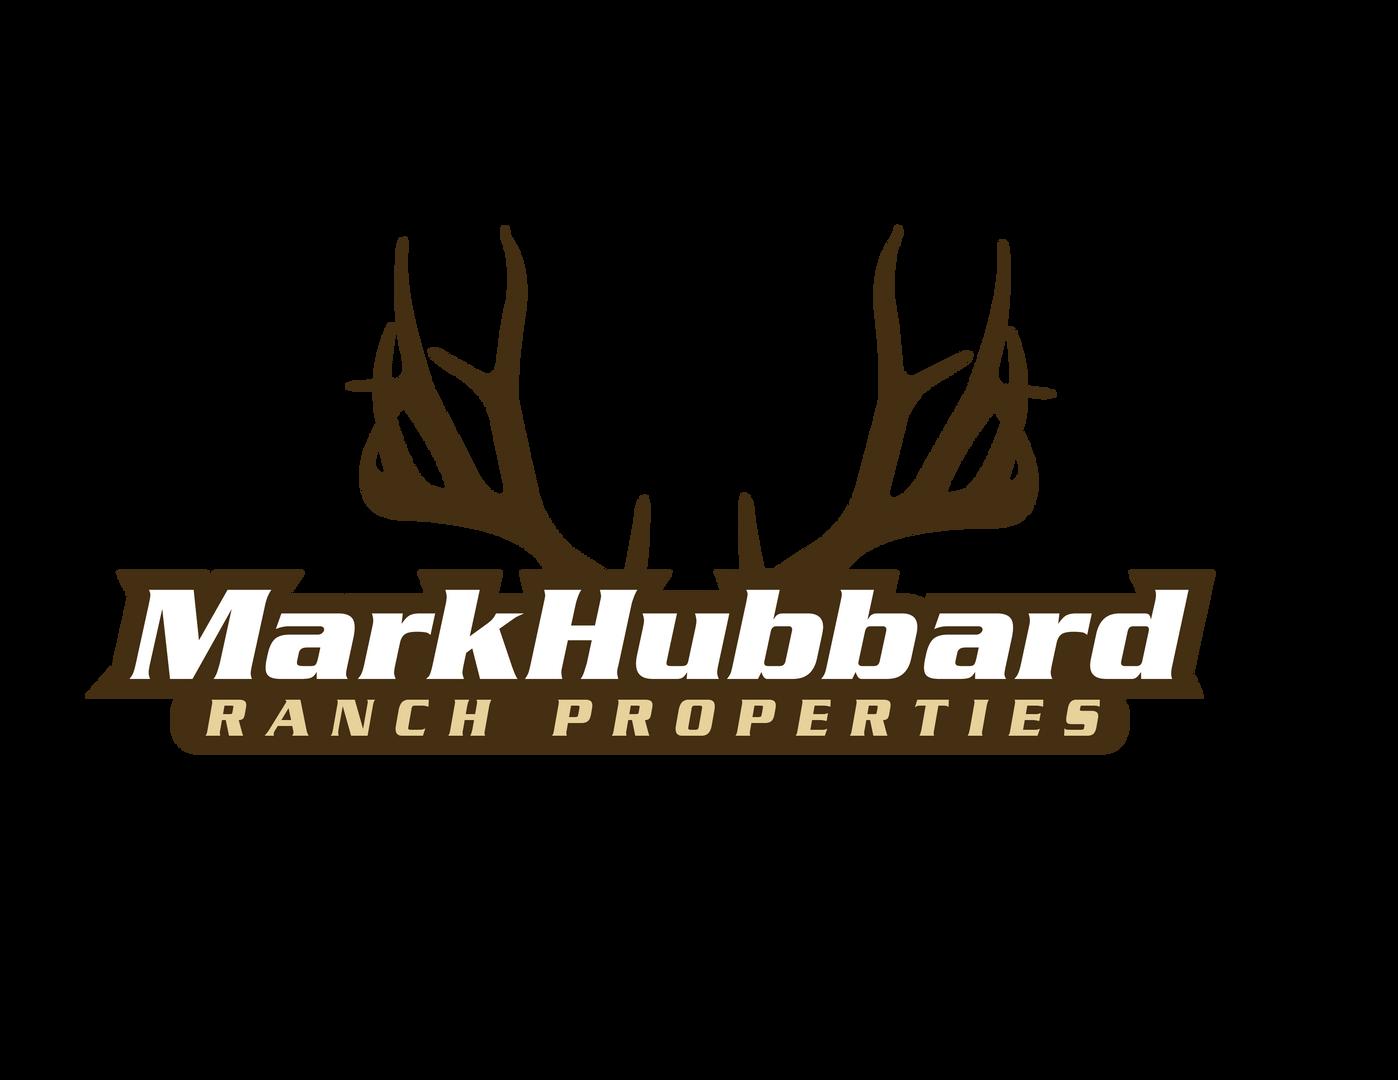 MarkHubbardlogo.png